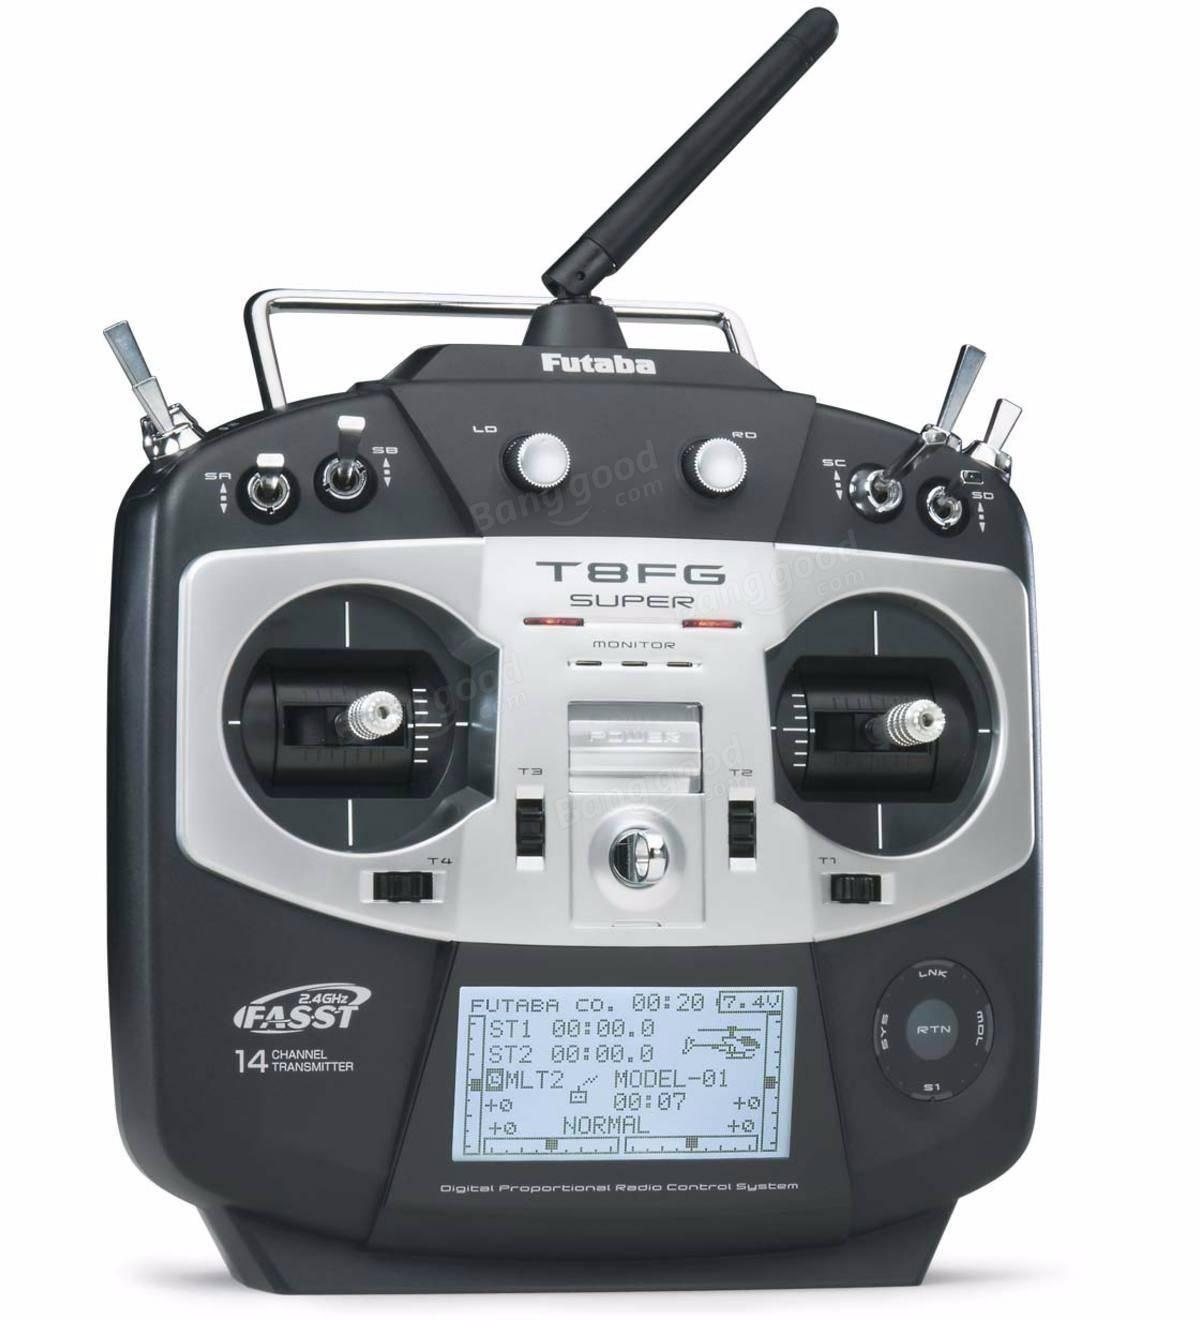 Futaba T8FG Siêu 2.4G 14CH FASST Transmitter Với SBUS 8CH R6208SB Receiver